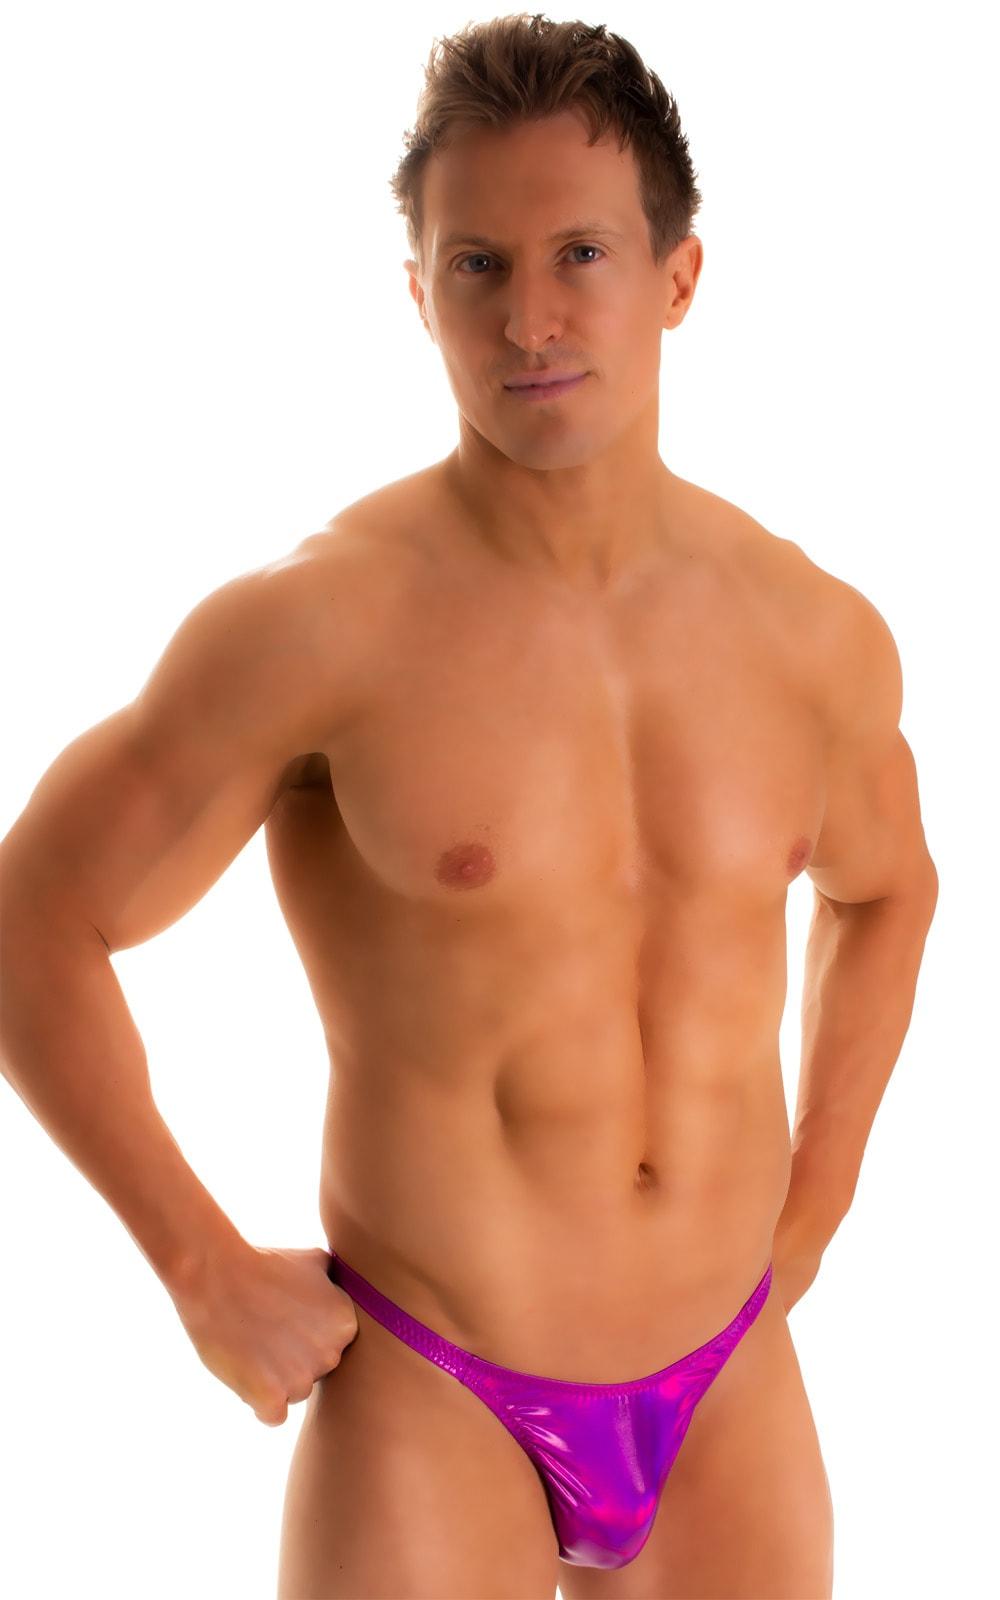 Rio Tanning Bikini Swimsuit in Holographic Liquid Fuschia 3